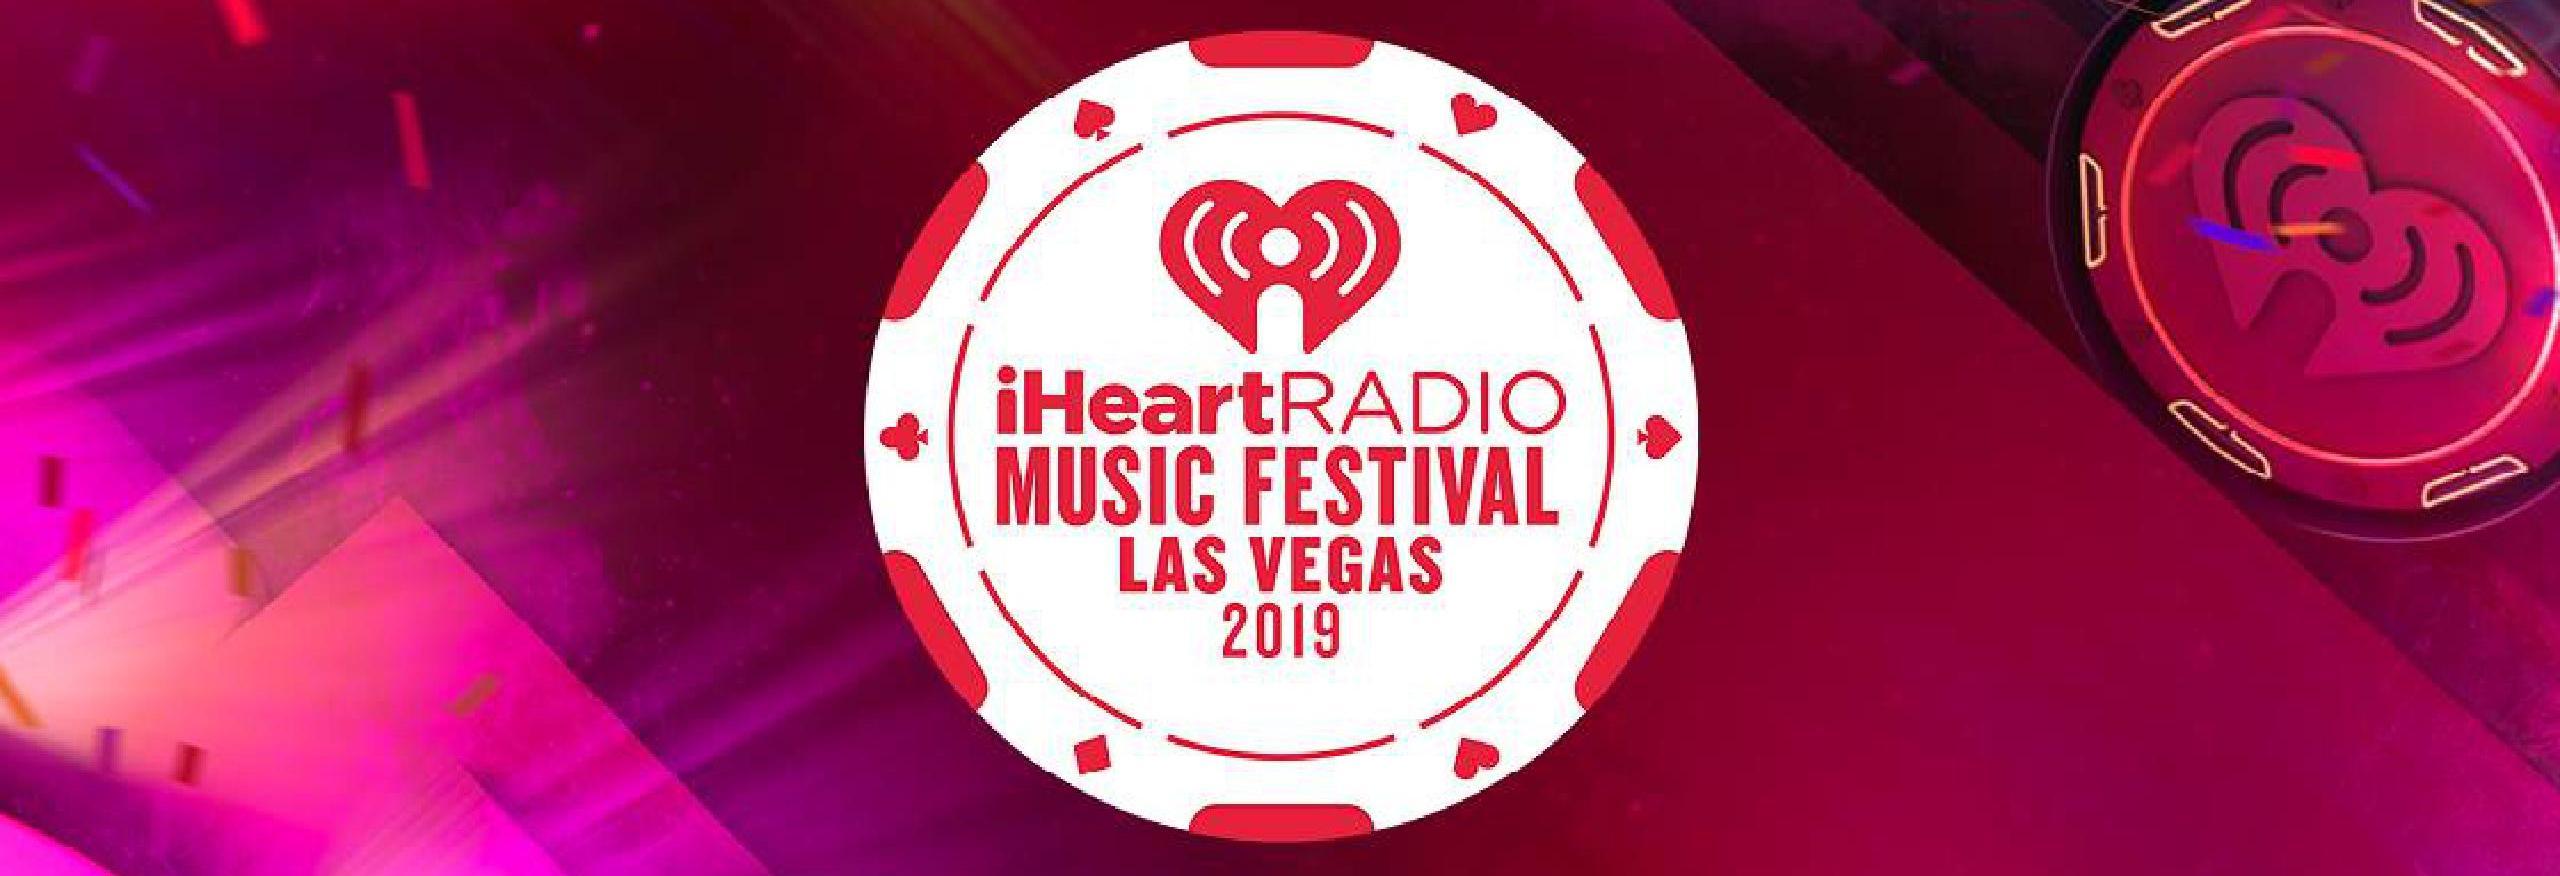 iheart radio music festival 103.7 country radio